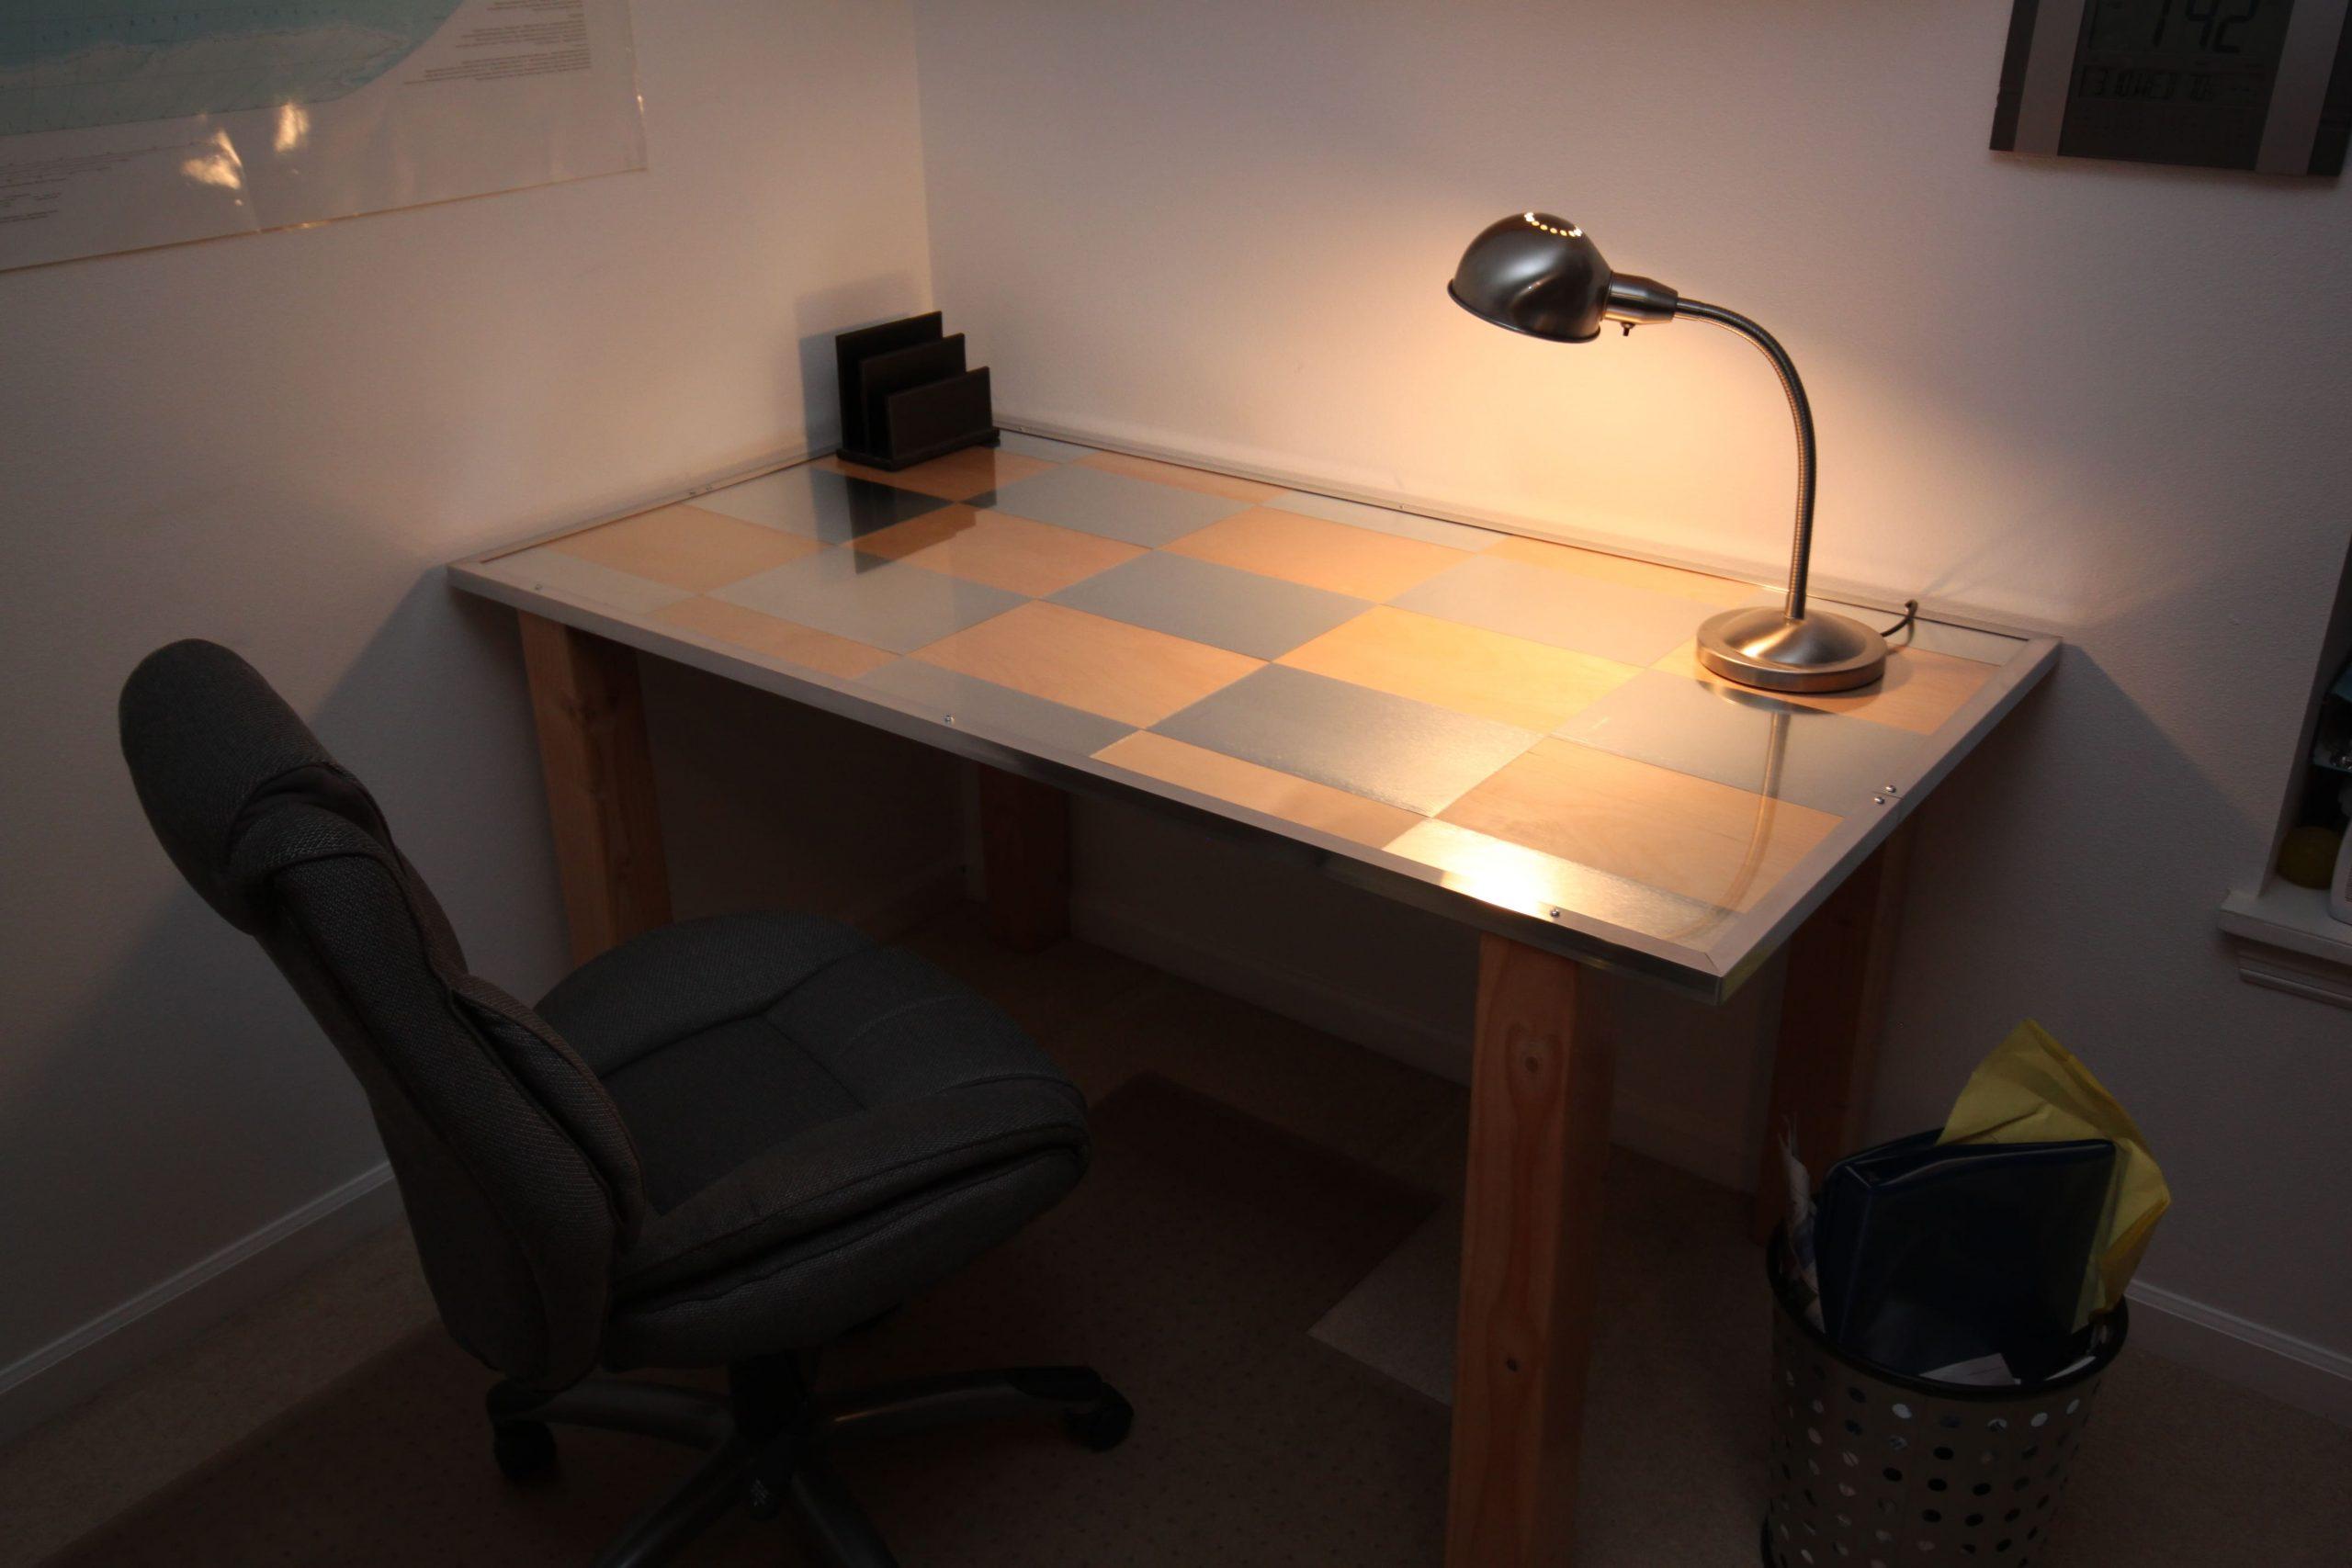 4.SIMPHOME.COM Birch Aluminium Desk